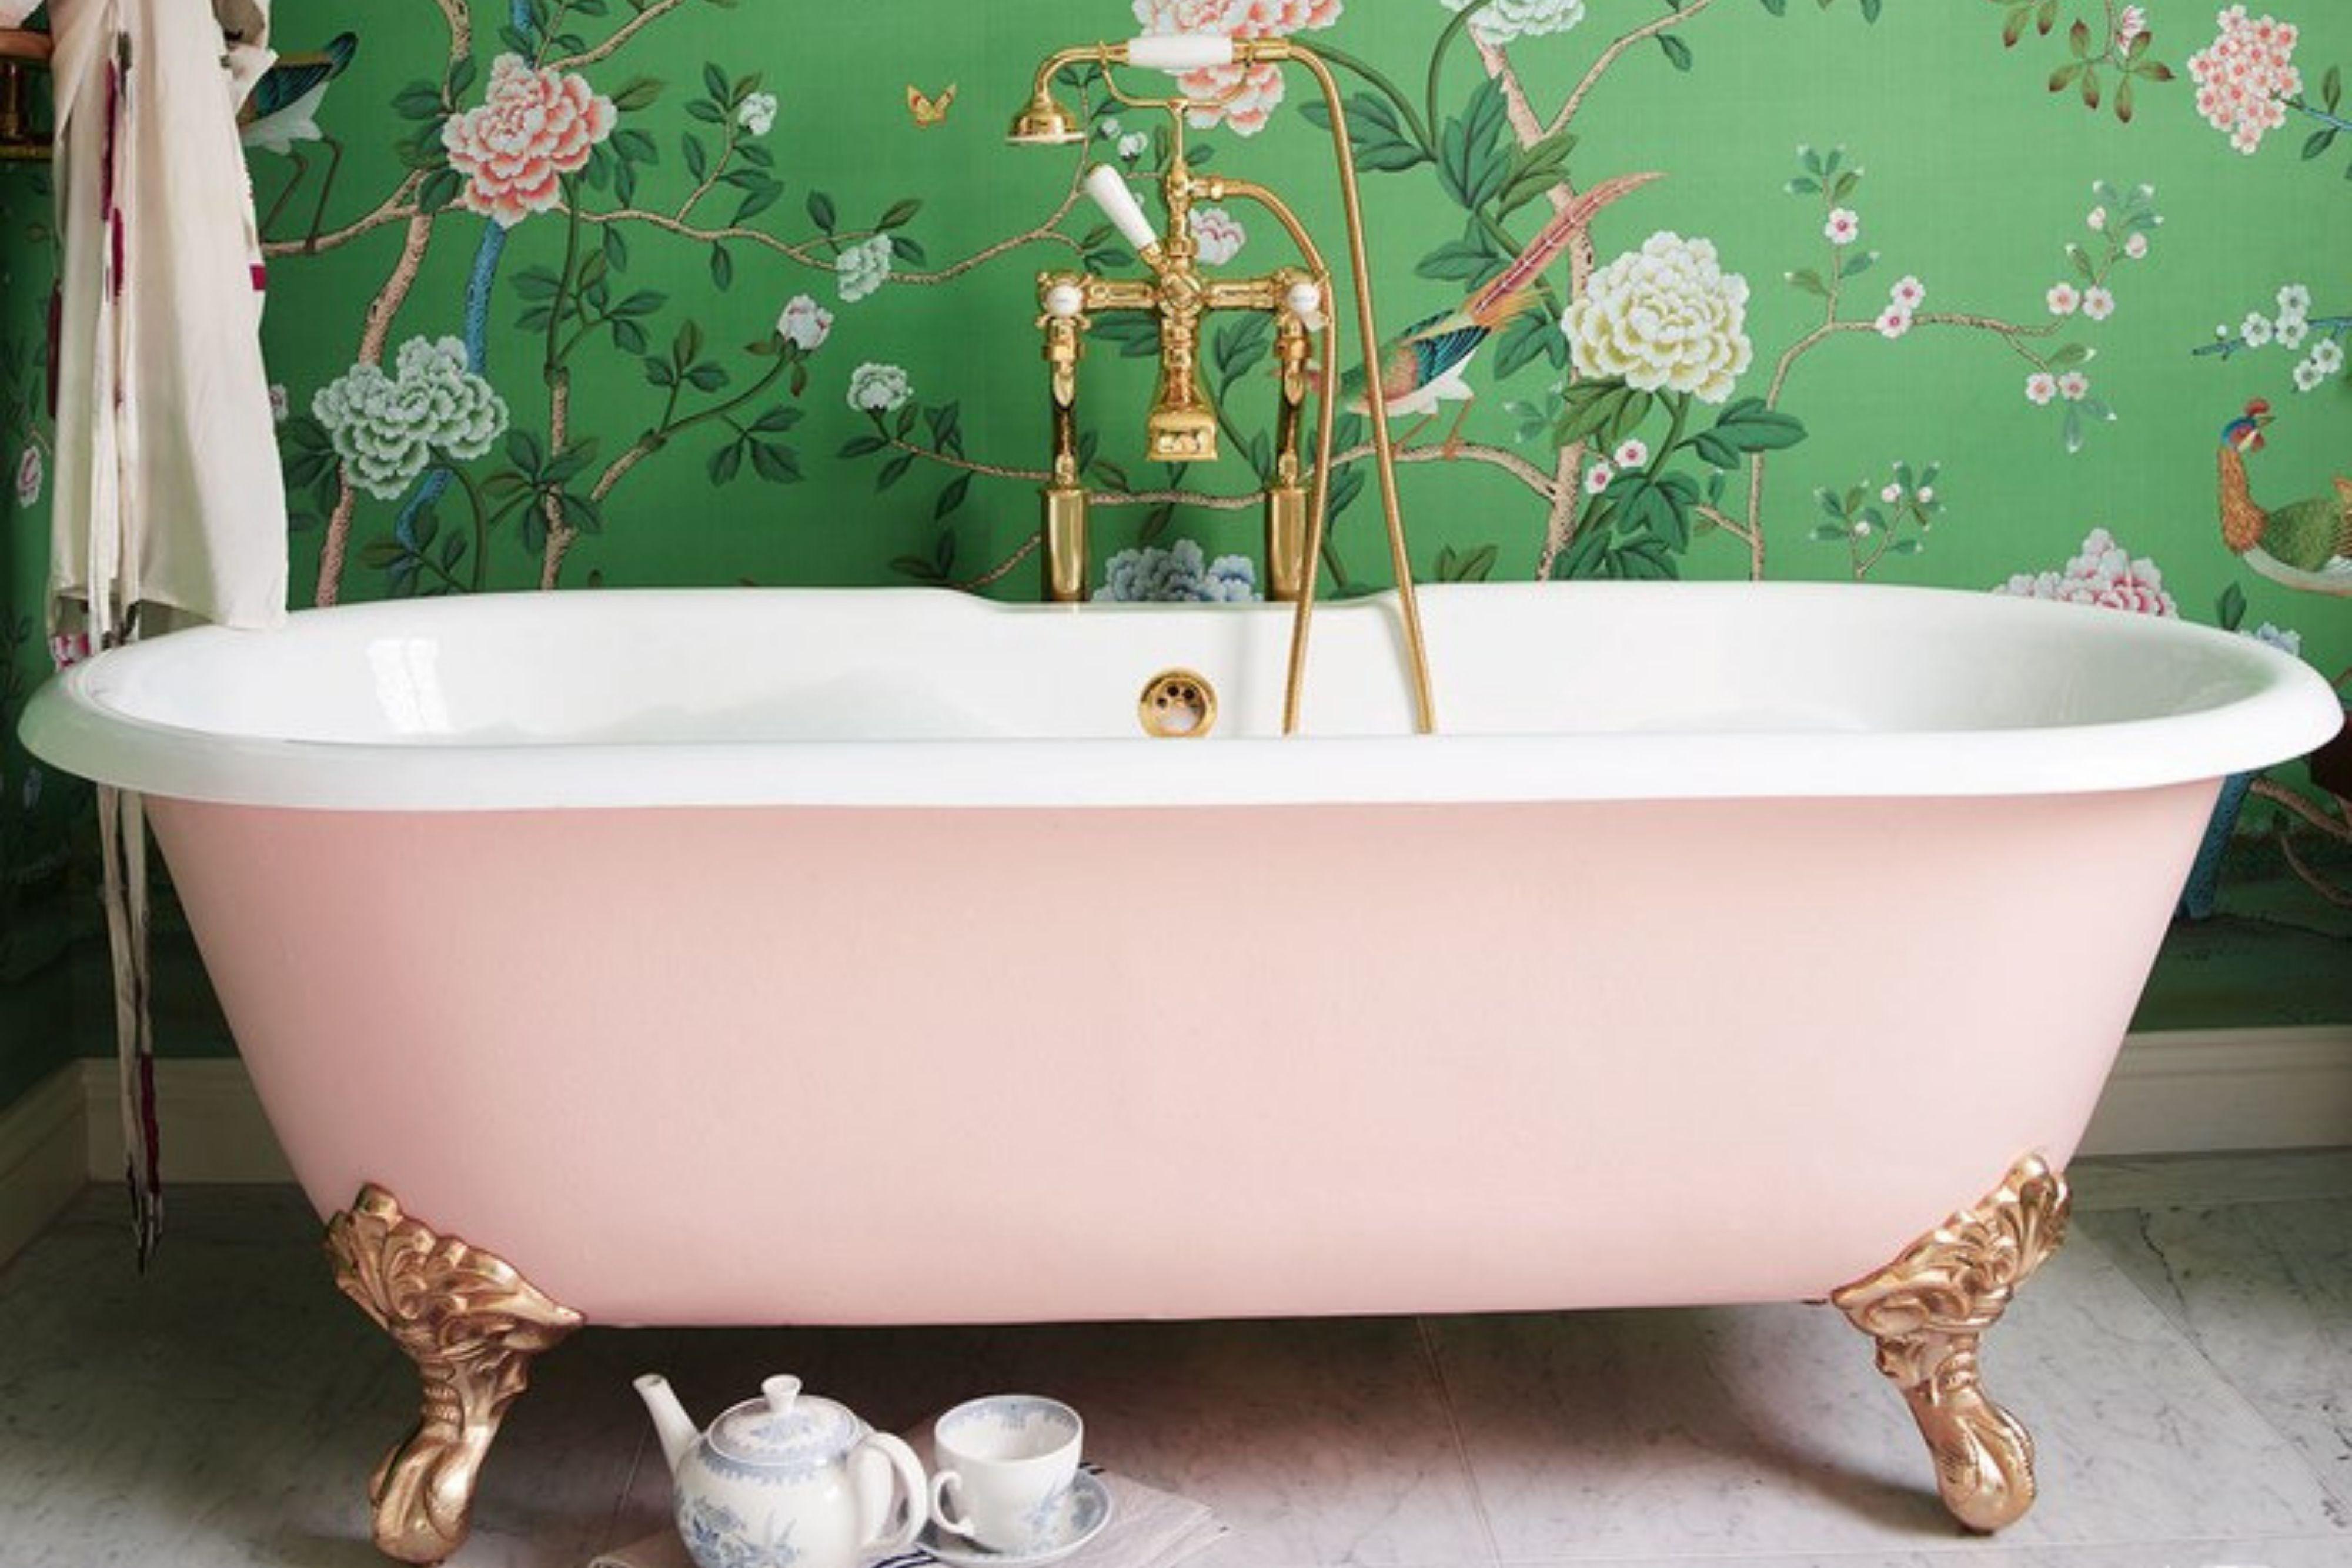 Vintage Claw Foot Tubs Clawfoot Tub Pink Tub Vintage Tub